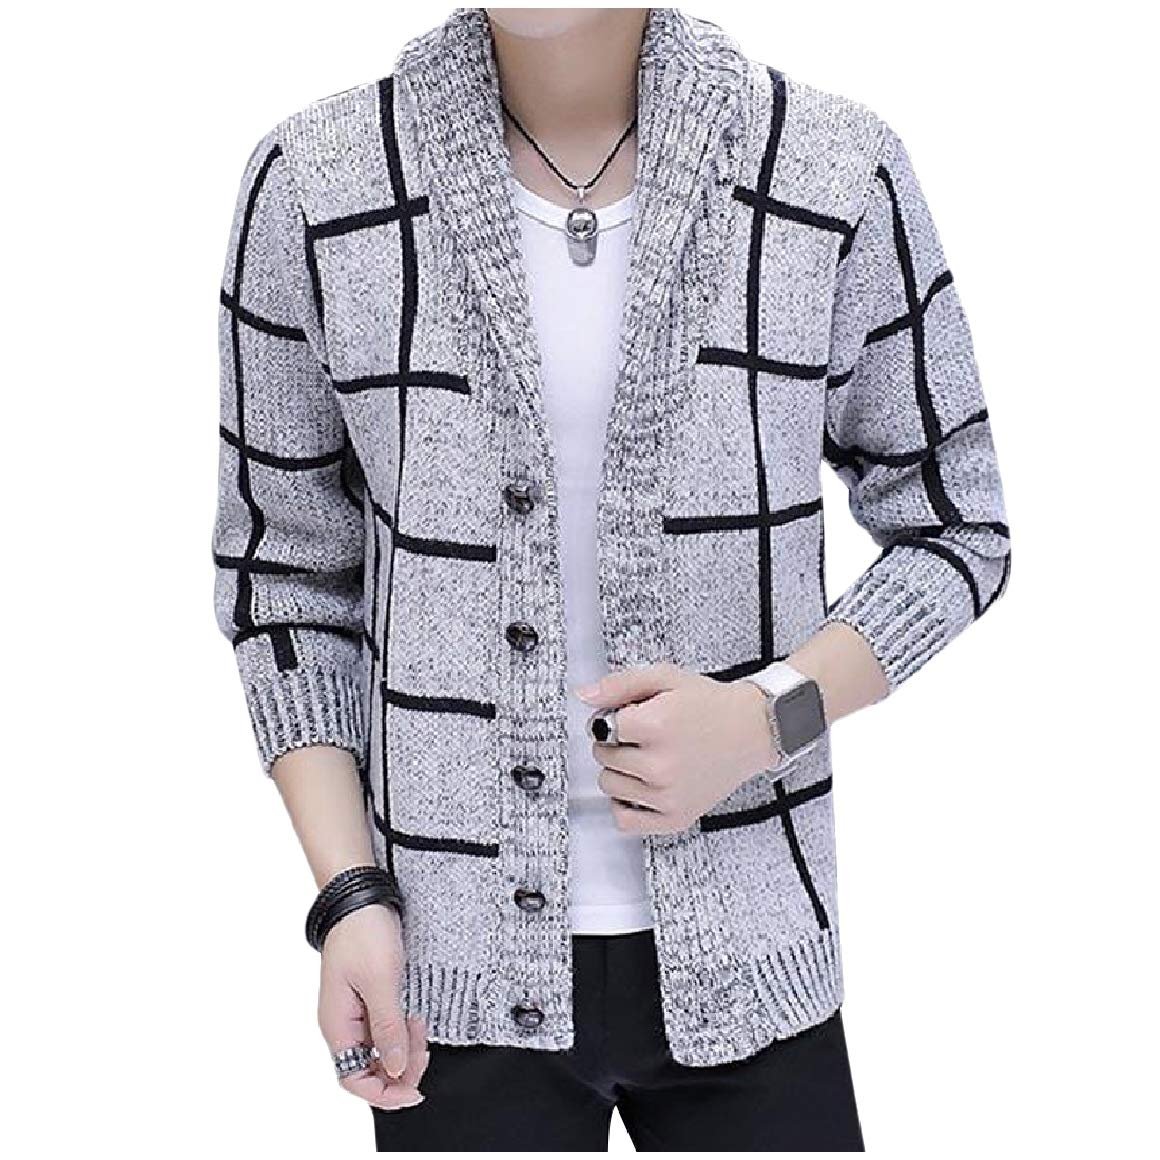 RDHOPE-Men Loose-Fit Casual Knitwear Button Down Shawl Collar Cardigan